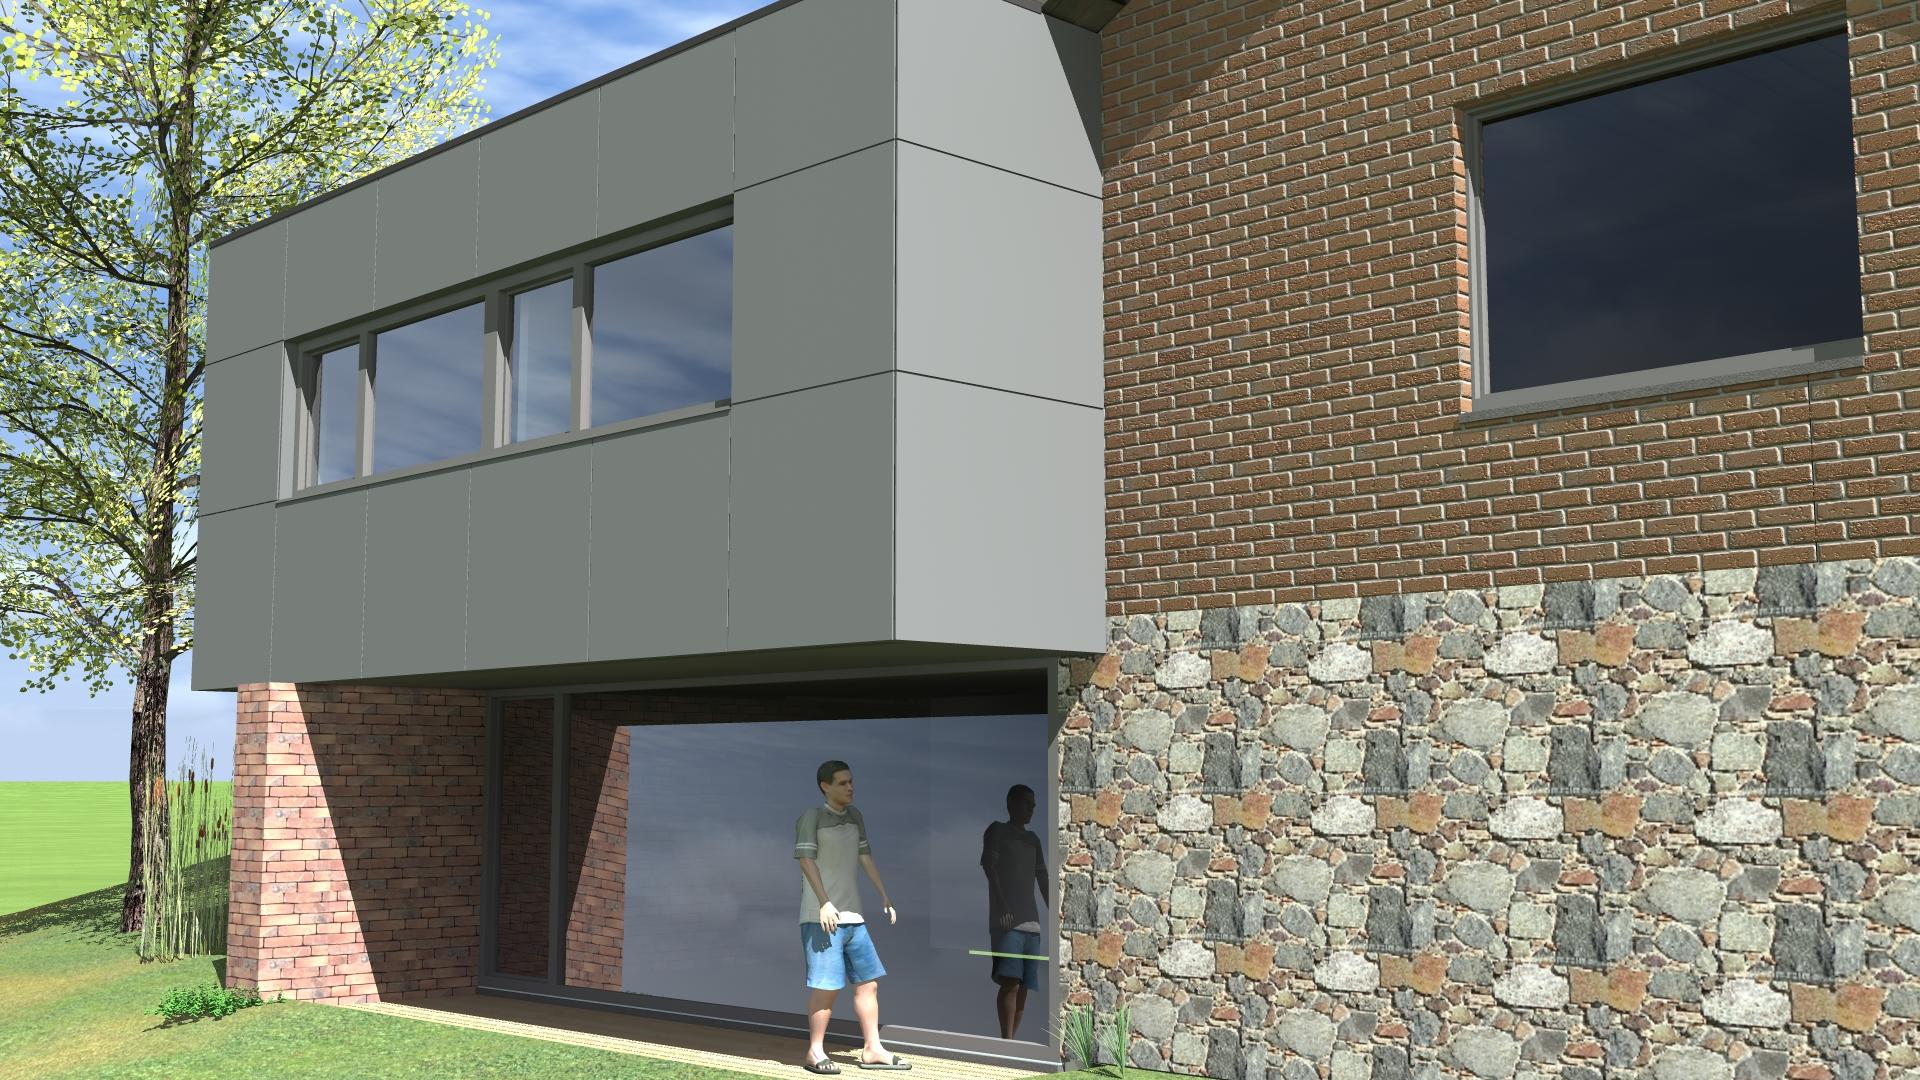 tilkin brice architecte li ge projet m 1 bureau d 39 architecture tilkin. Black Bedroom Furniture Sets. Home Design Ideas